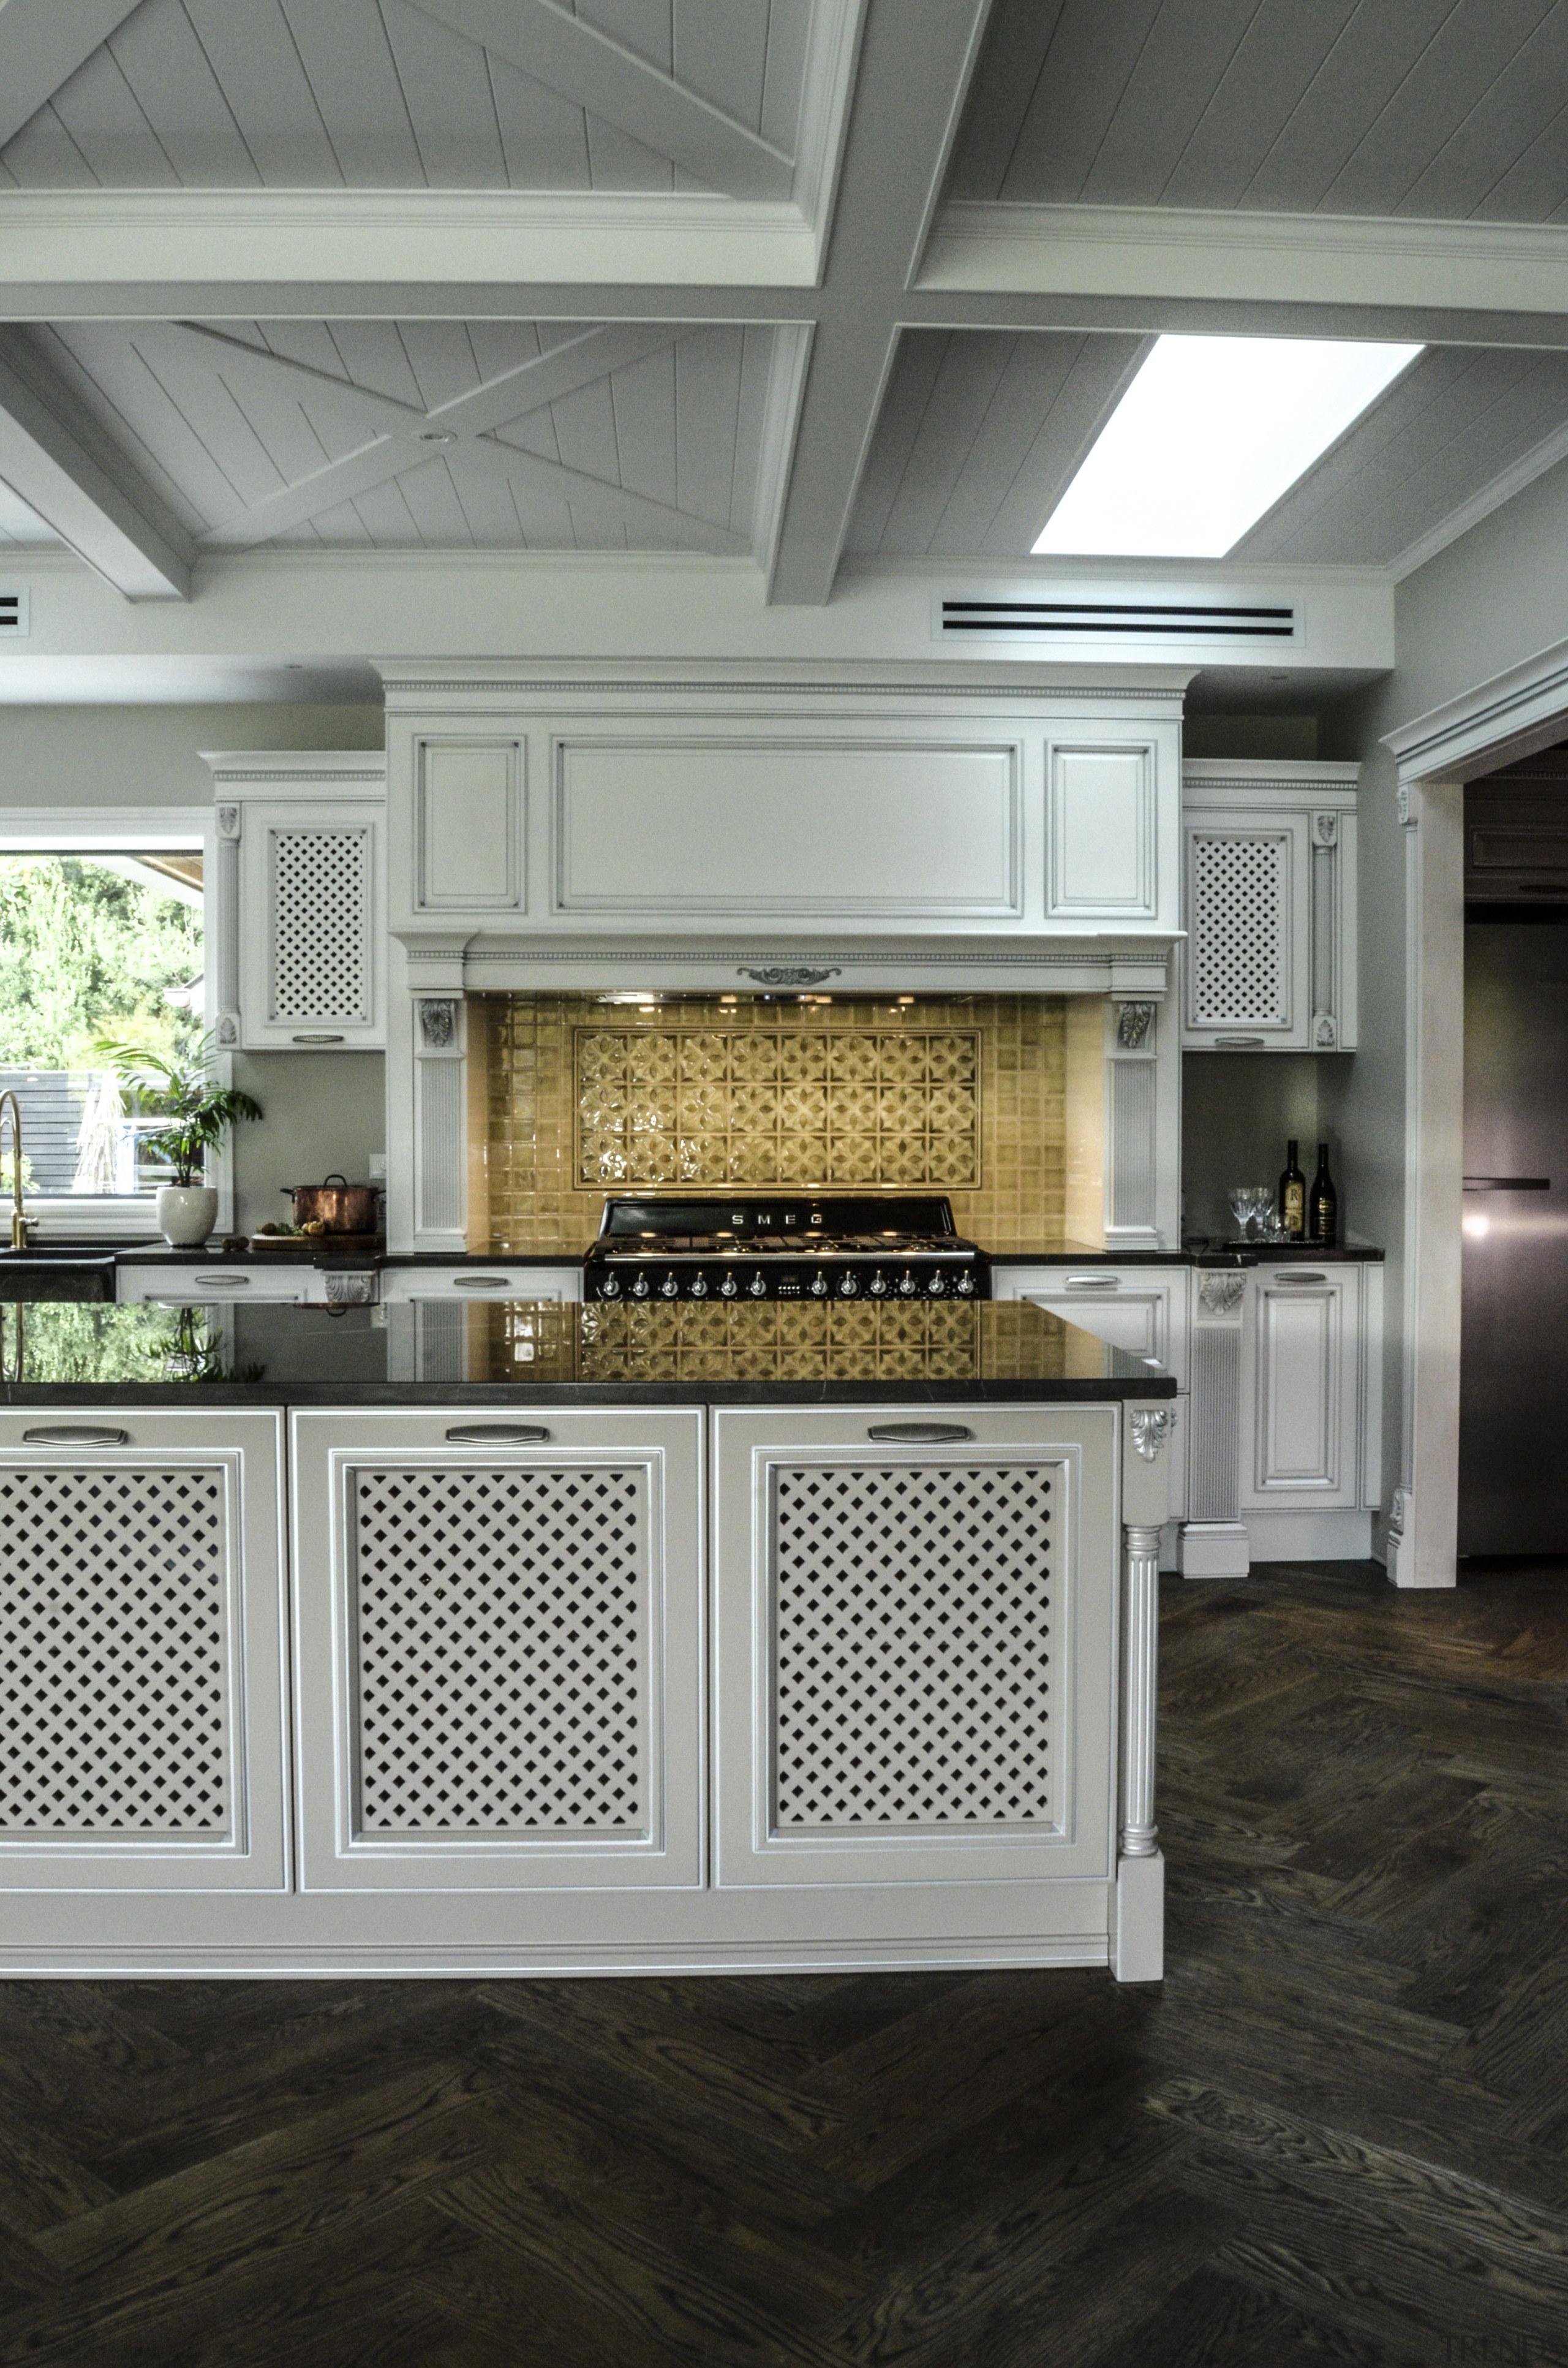 Goodland Residence 5 - Goodland Residence 5 - cabinetry, countertop, cuisine classique, floor, flooring, interior design, kitchen, gray, black